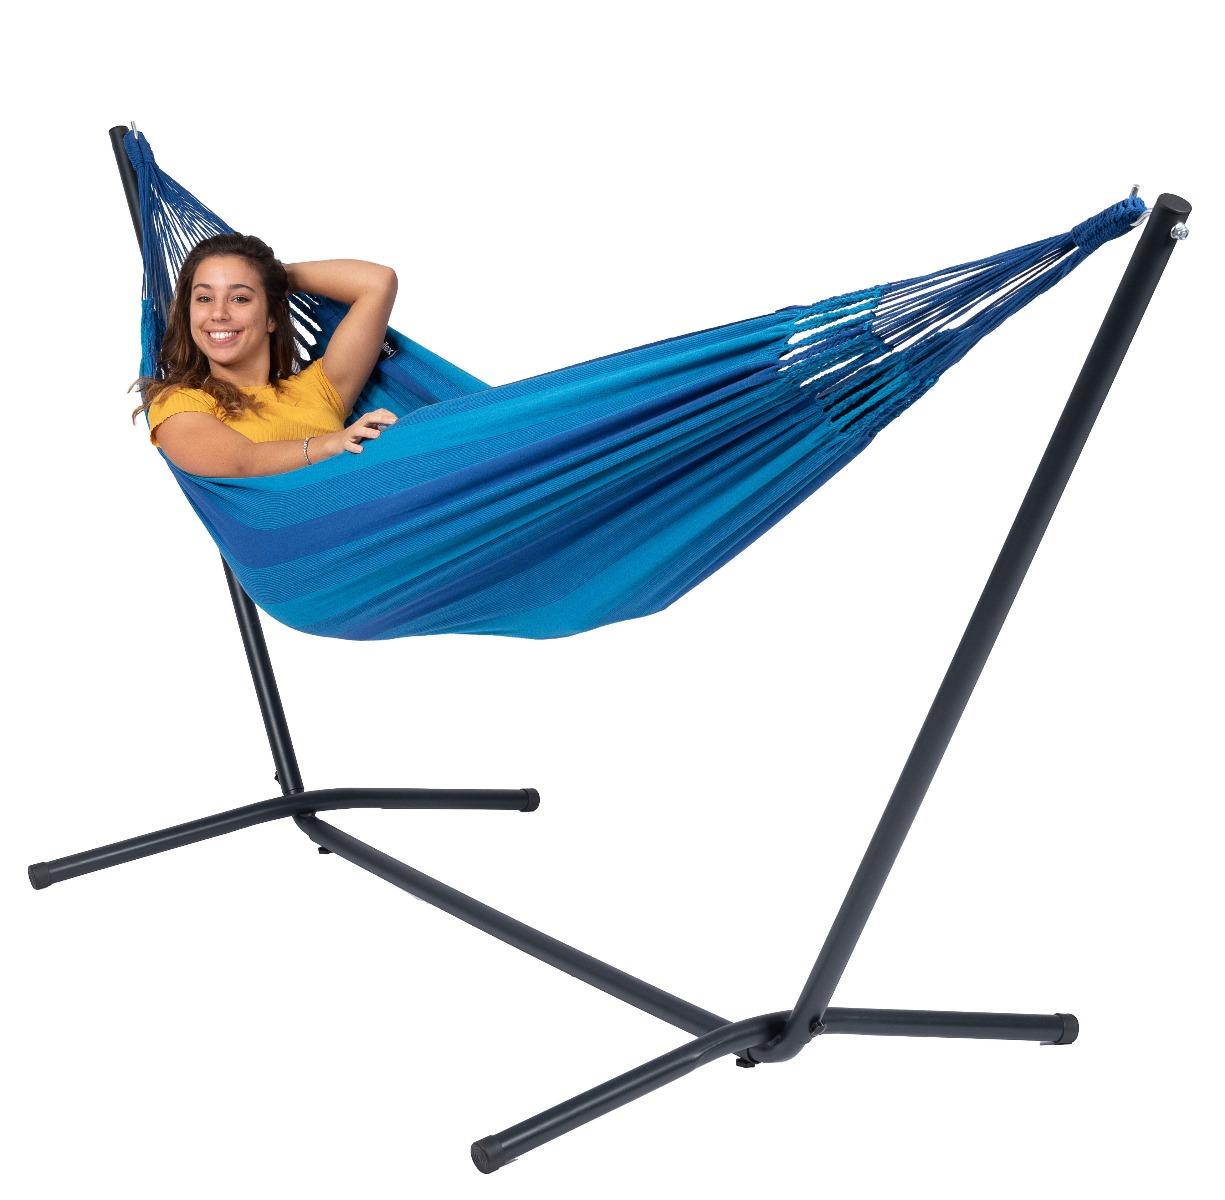 'Easy & Dream' Blue E�npersoons Hangmatset - Blauw - Tropilex �